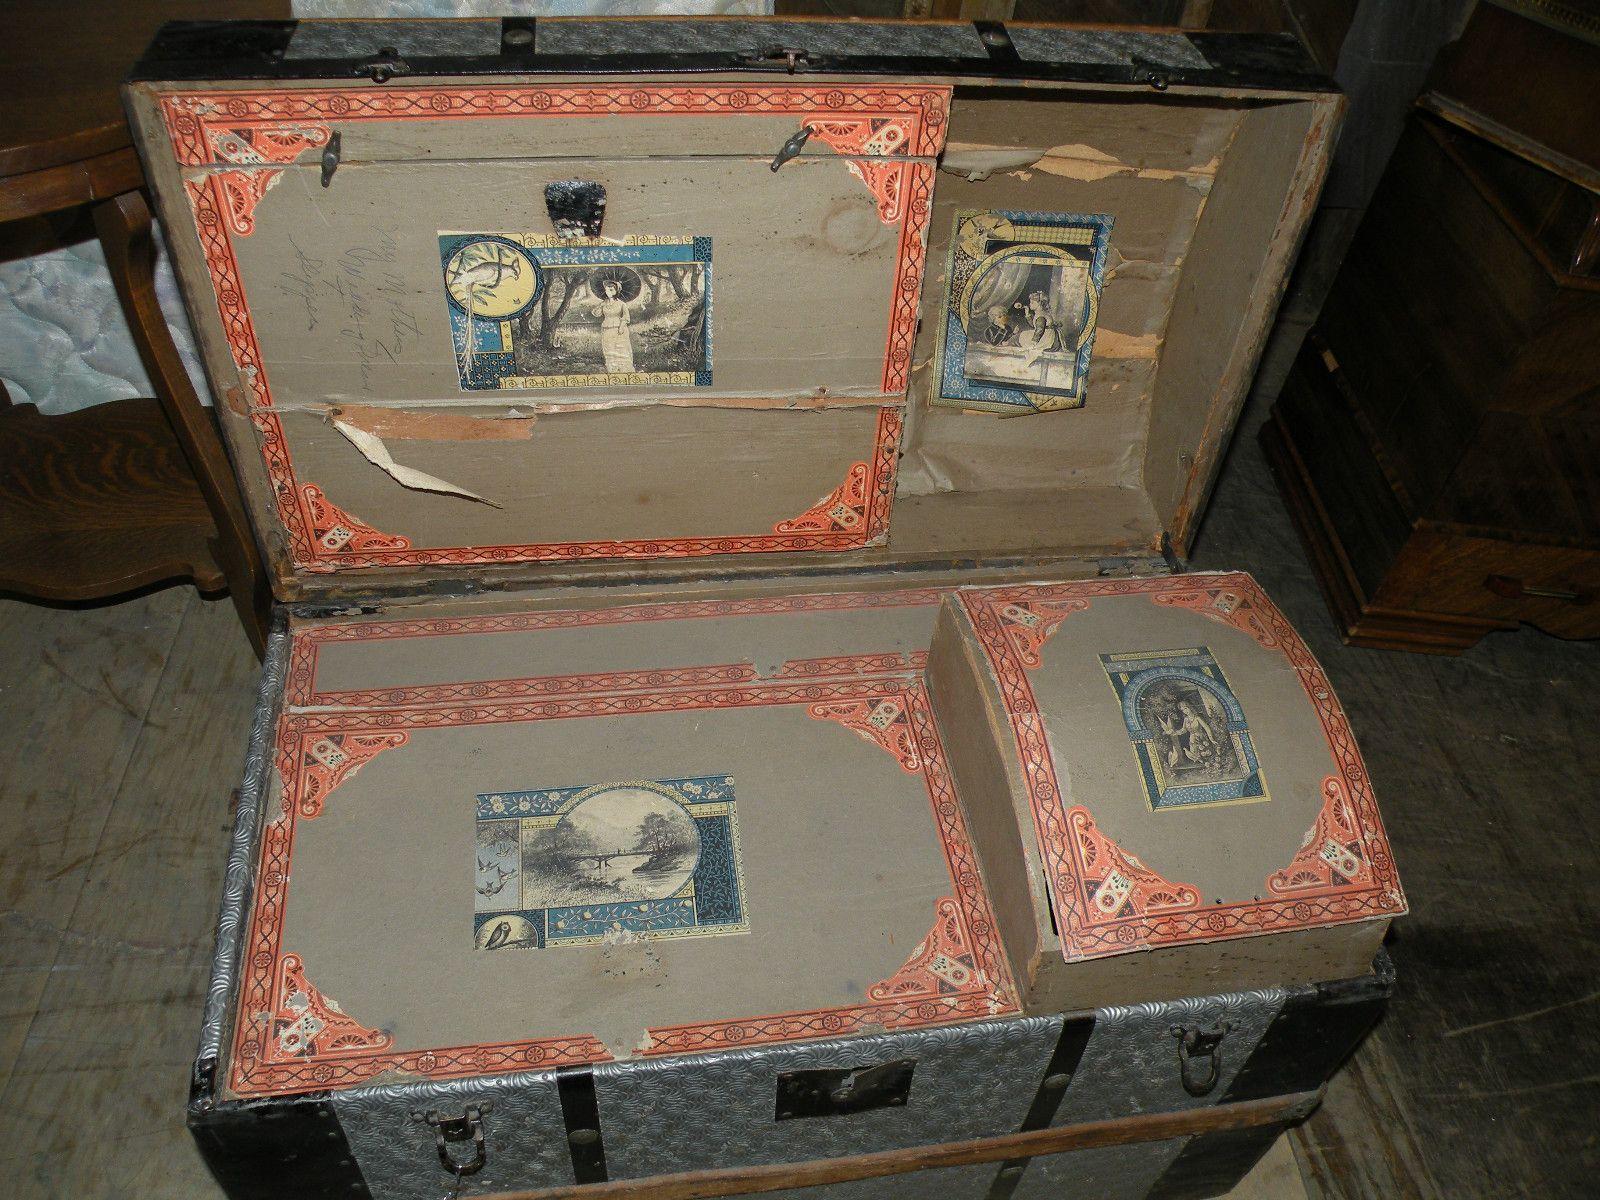 Details About Antique Saratoga Humpback Wood Slat Metal